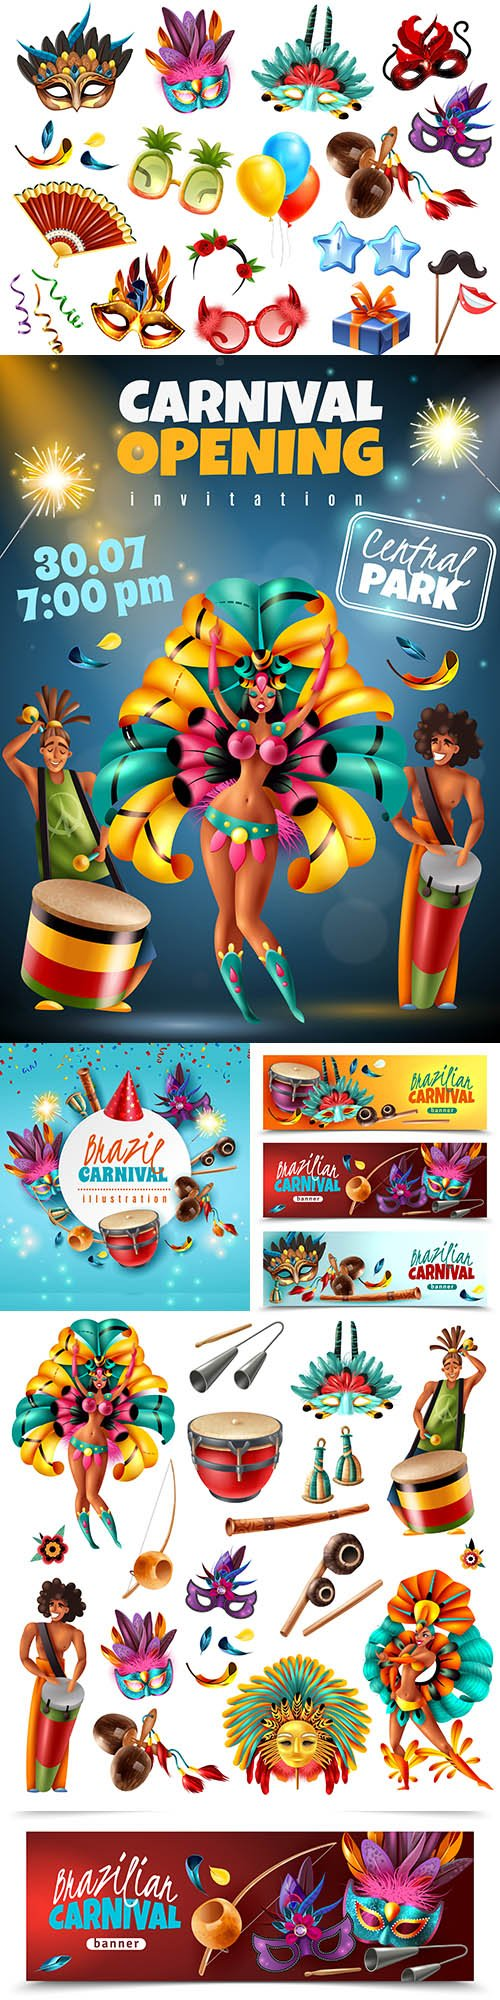 Brazilian carnival colorful invitations and elements